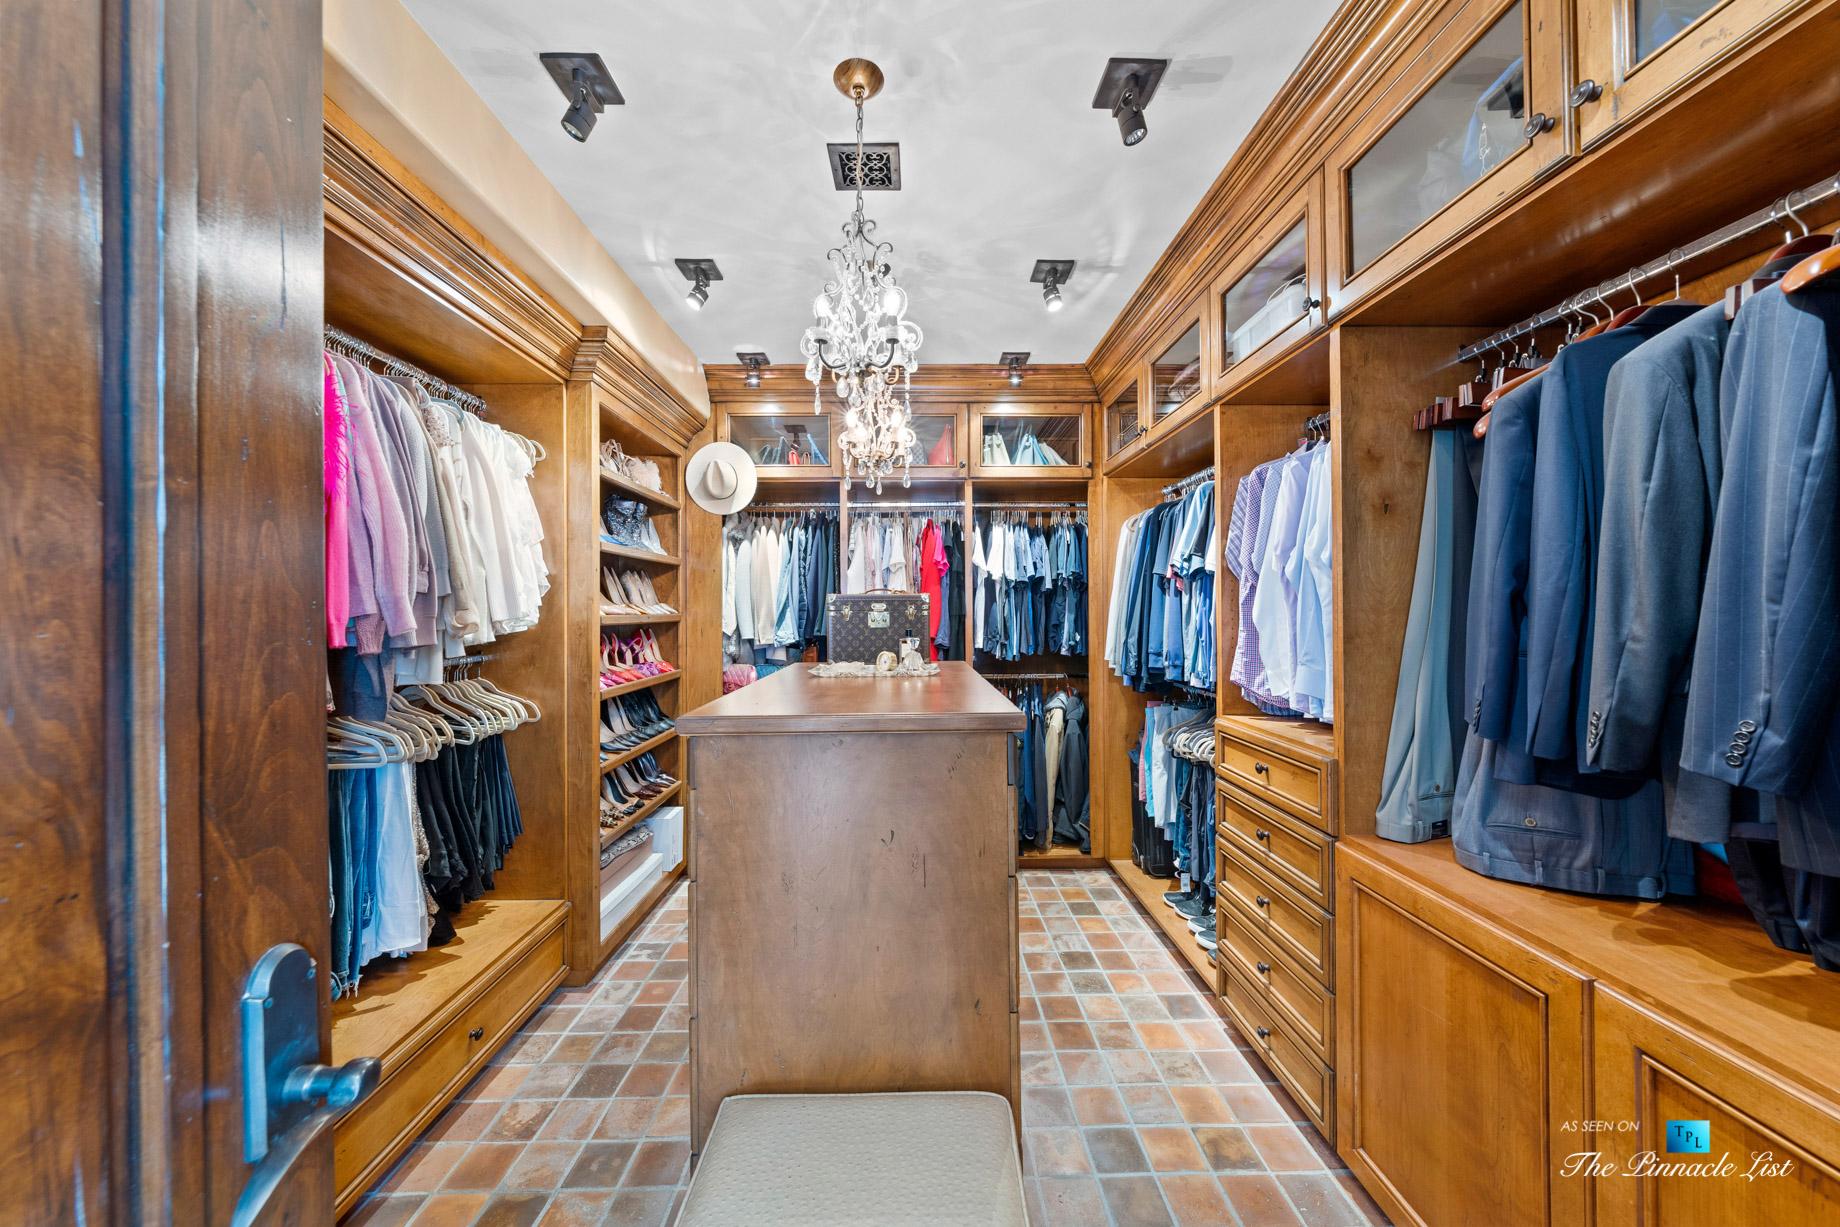 216 7th St, Manhattan Beach, CA, USA - Luxury Real Estate - Coastal Villa Home - Master Bedroom Walk In Closet